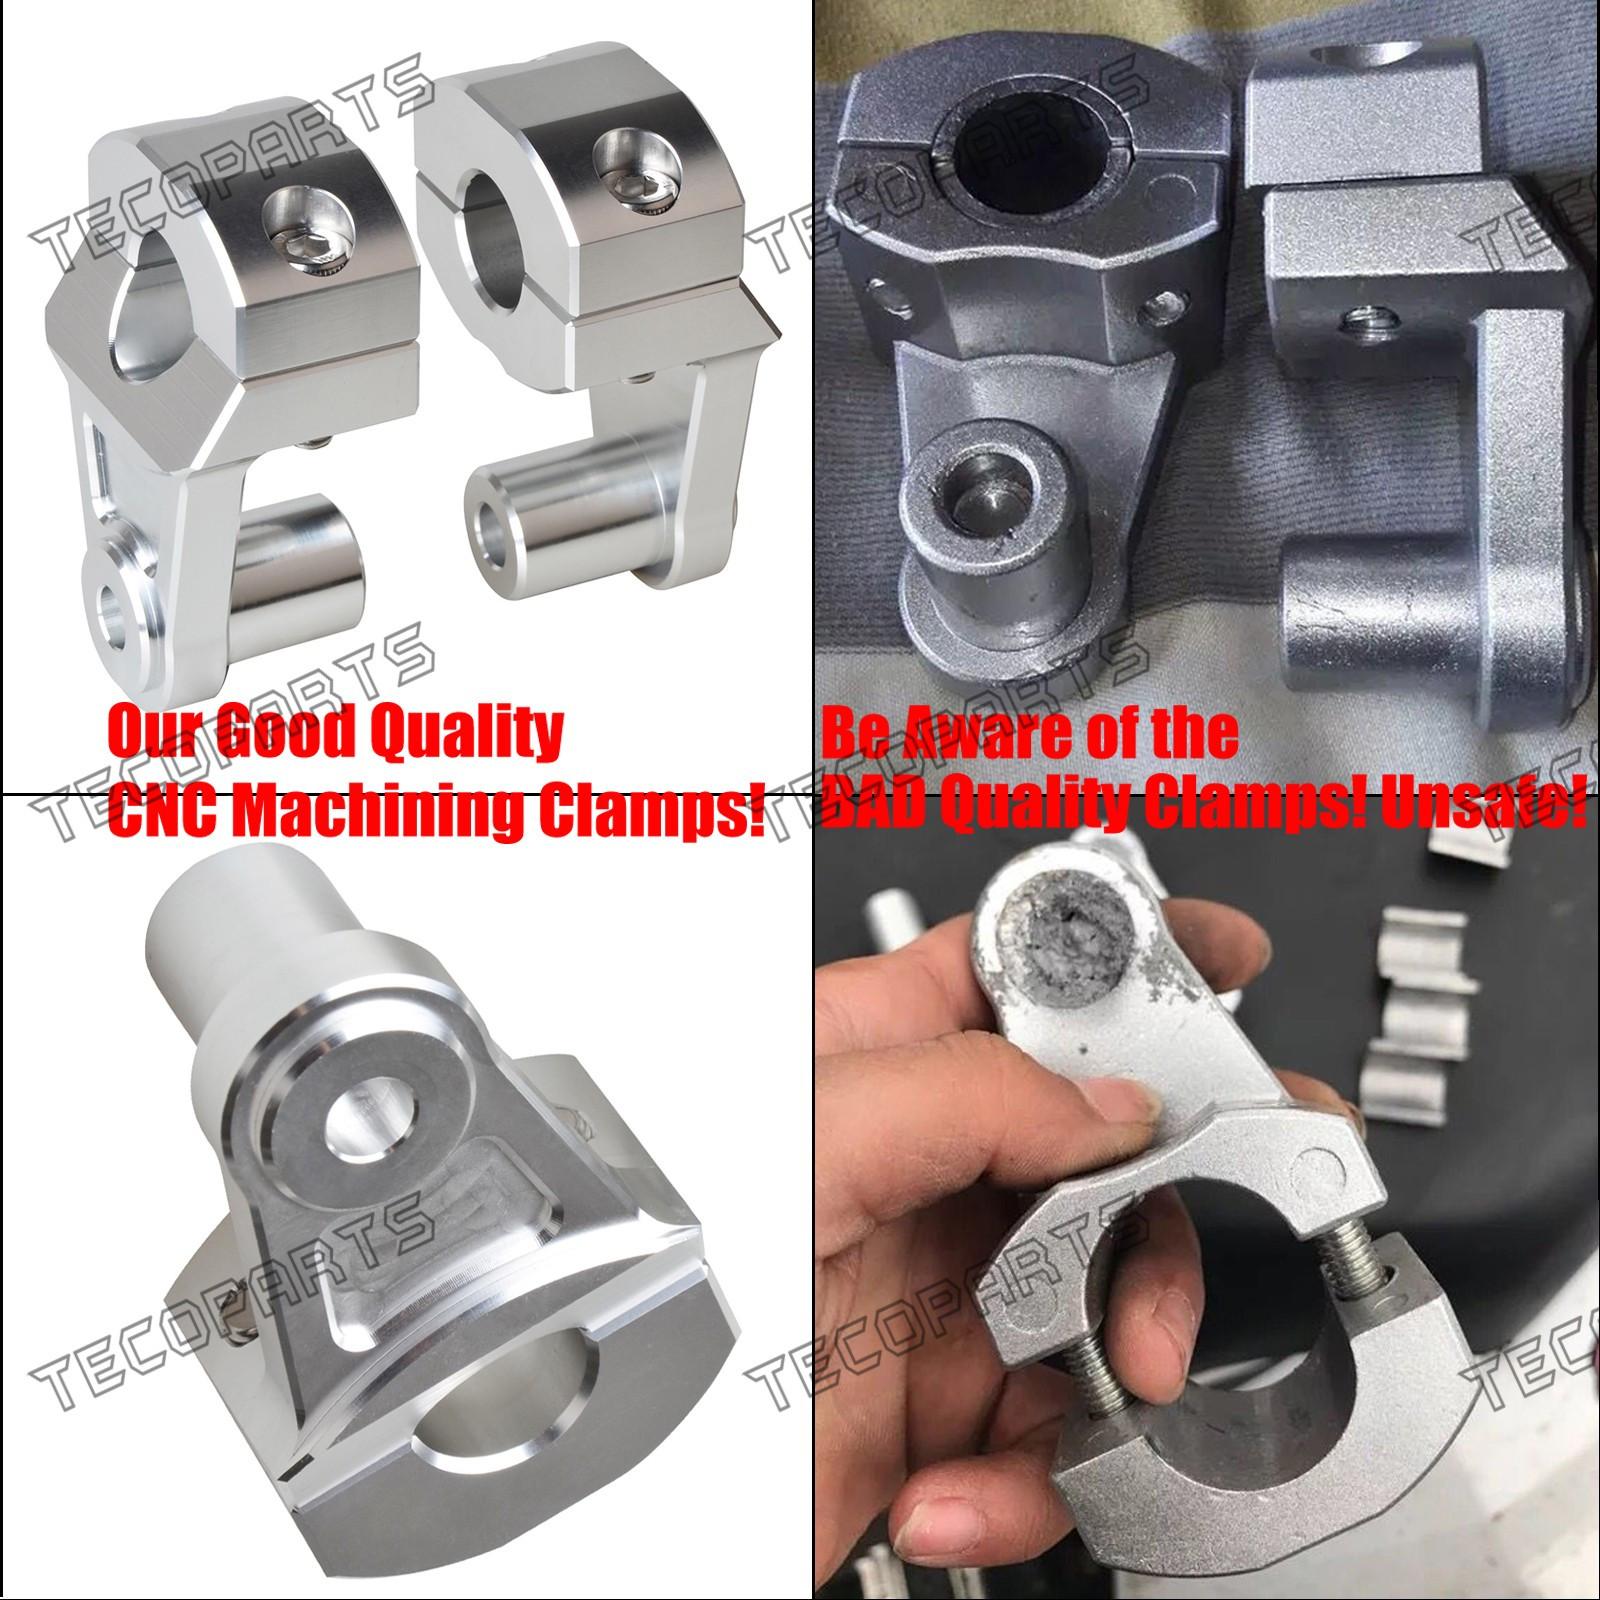 1-1//8/'/' Pivot CNC Handlebar Riser Clamp 4 Yamaha Vmax,KTM 690//990,Ducati,Triumph